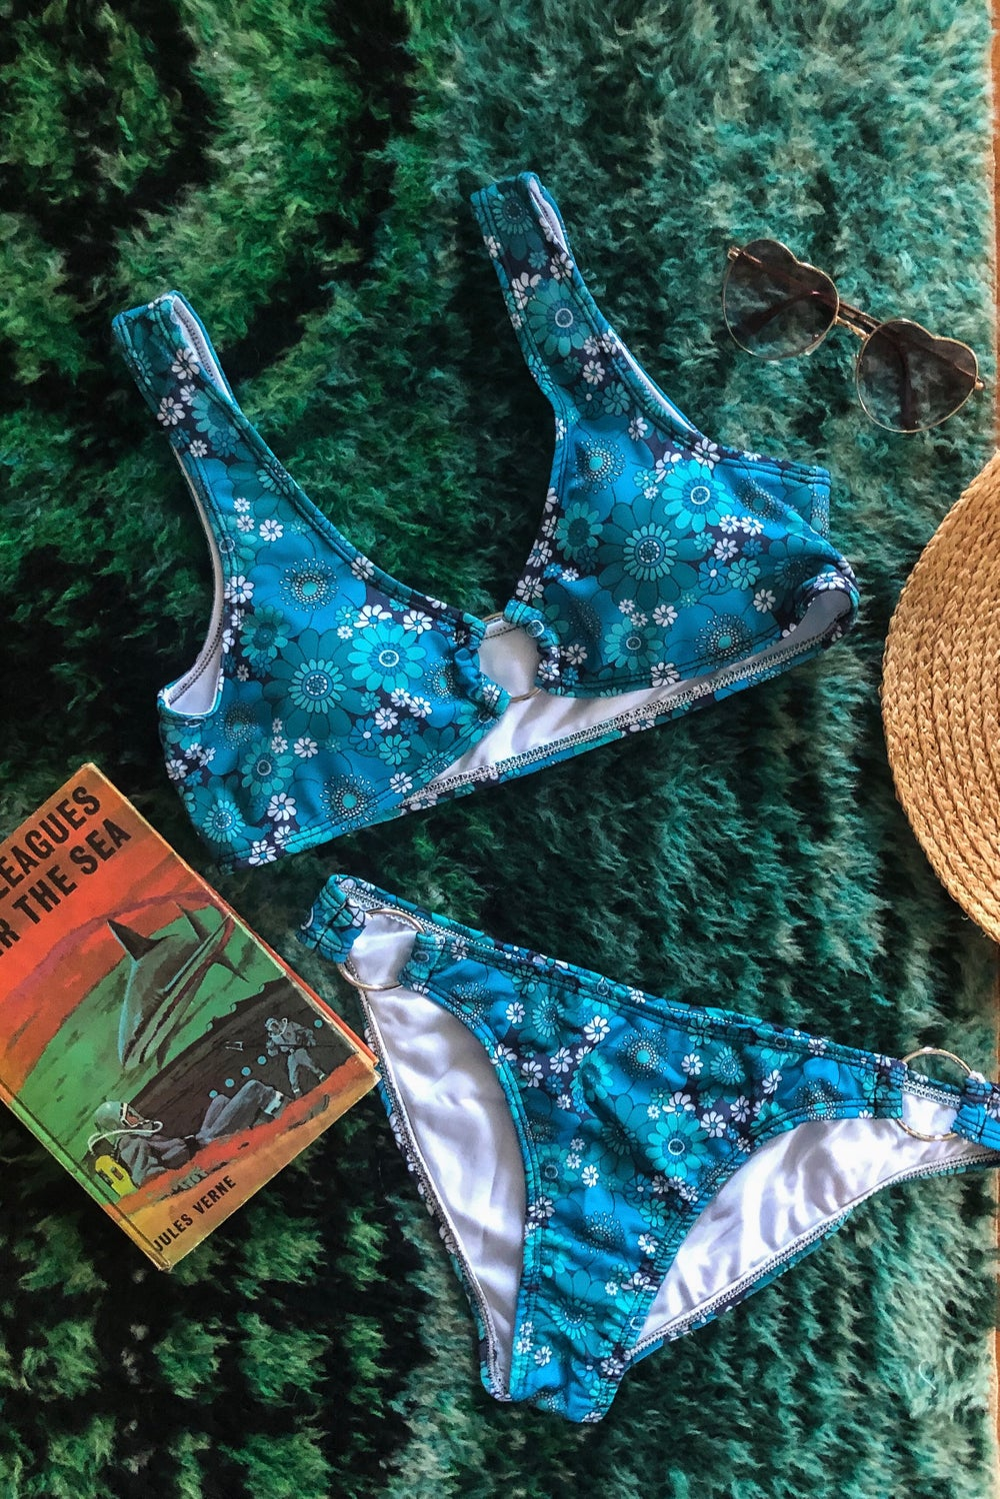 60's ring bikini in Pushing daisies Blue